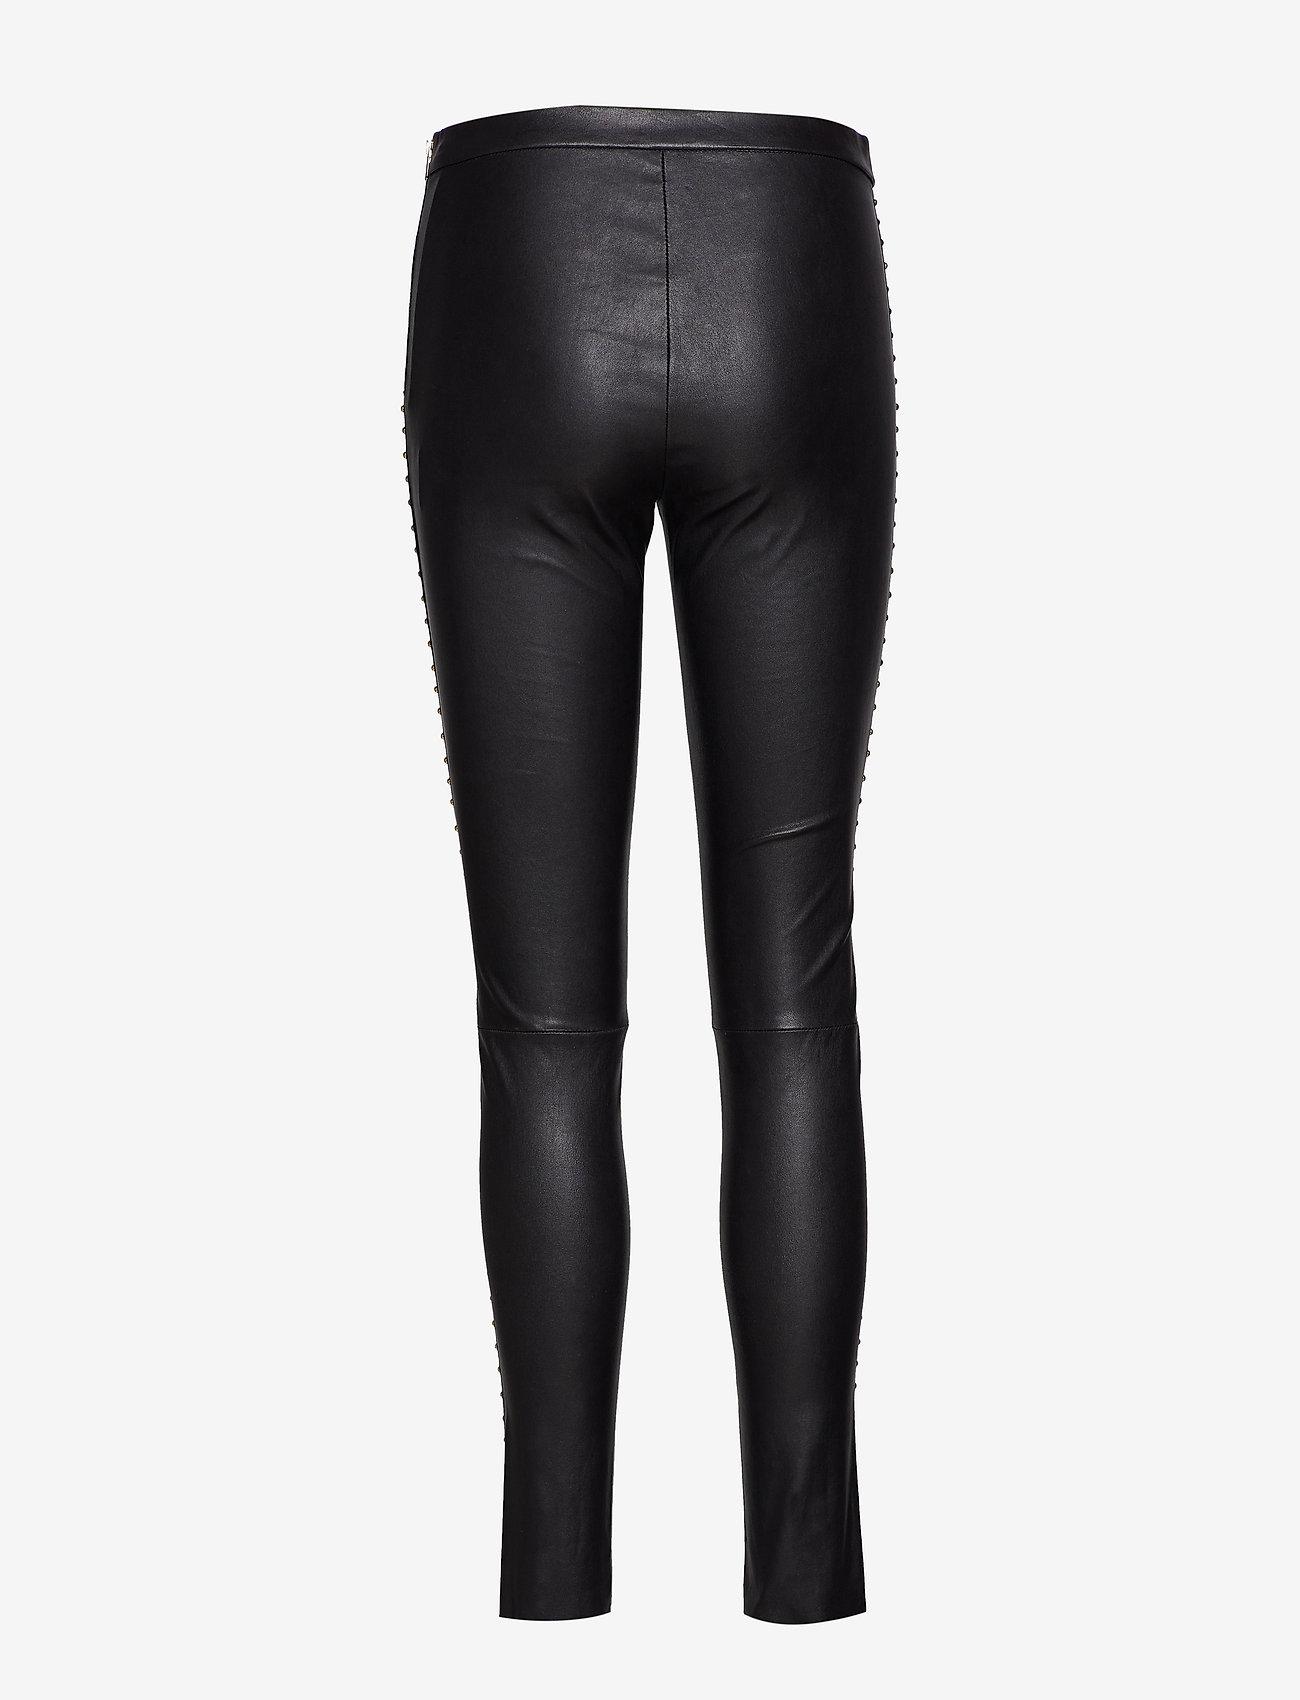 DEPECHE - Leggings w/studs - leggings - 097 gold (platino)